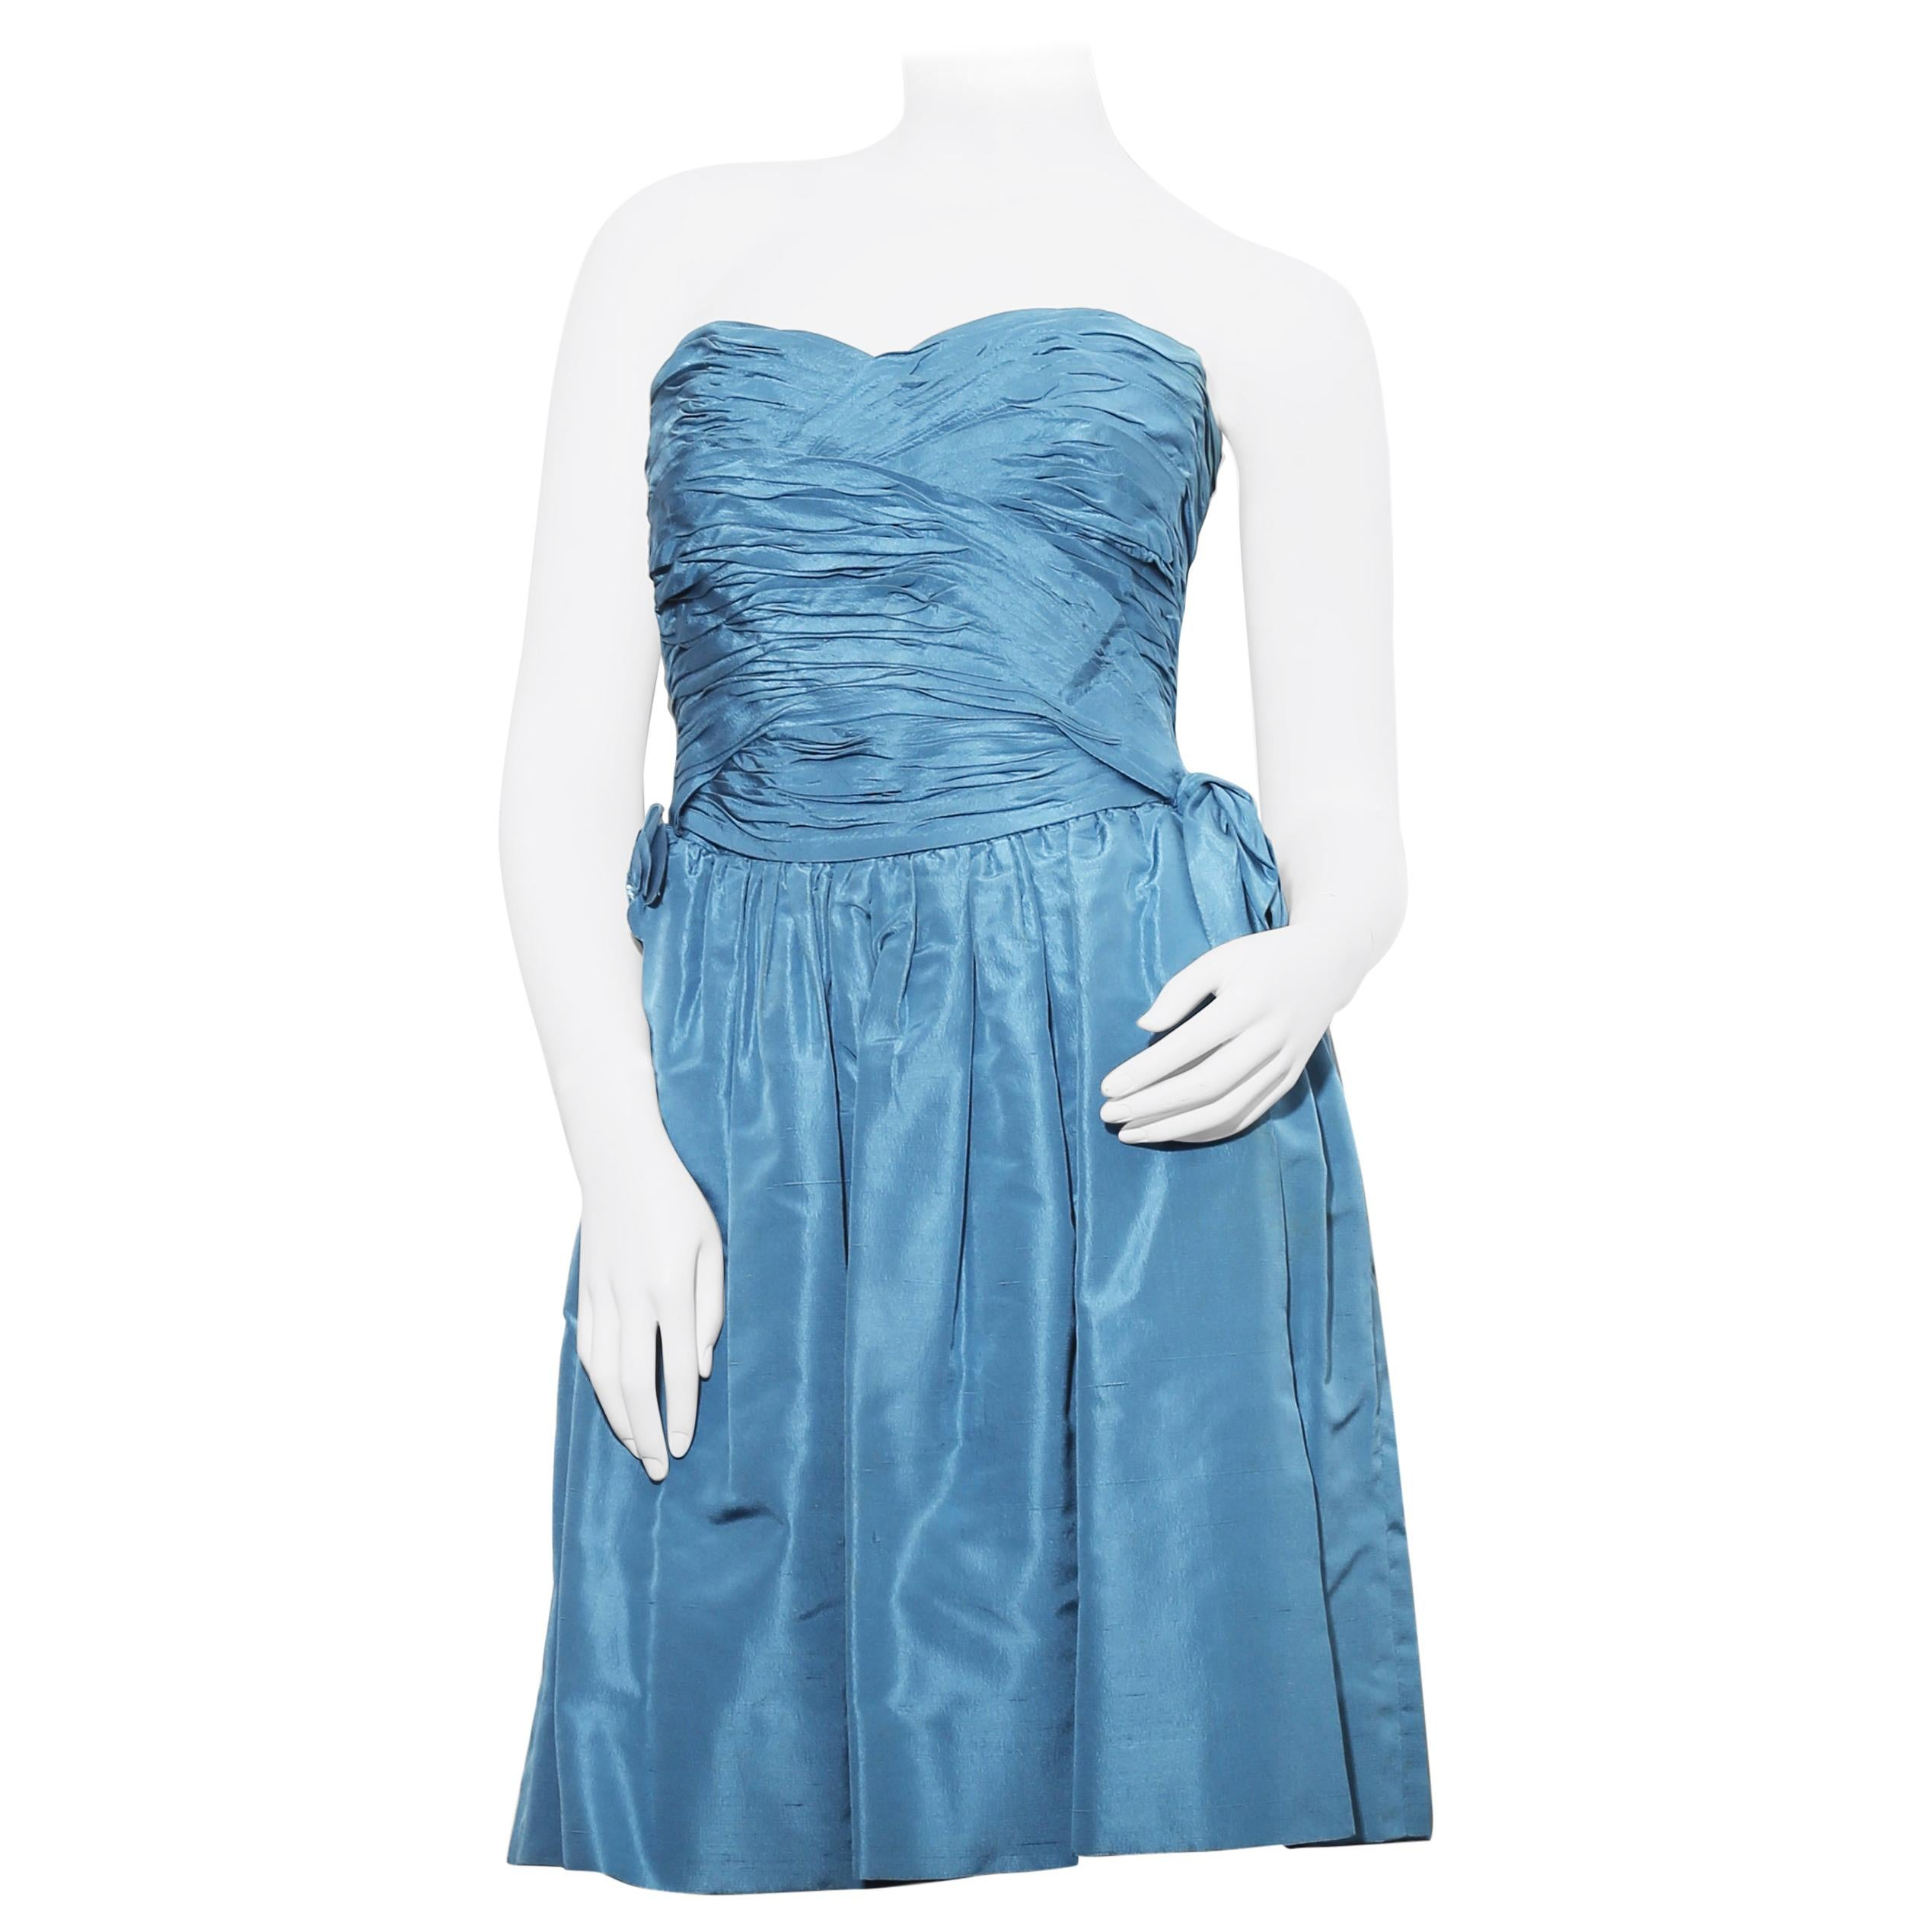 Vintage Silk Blue Jean Chanel dress with jacket